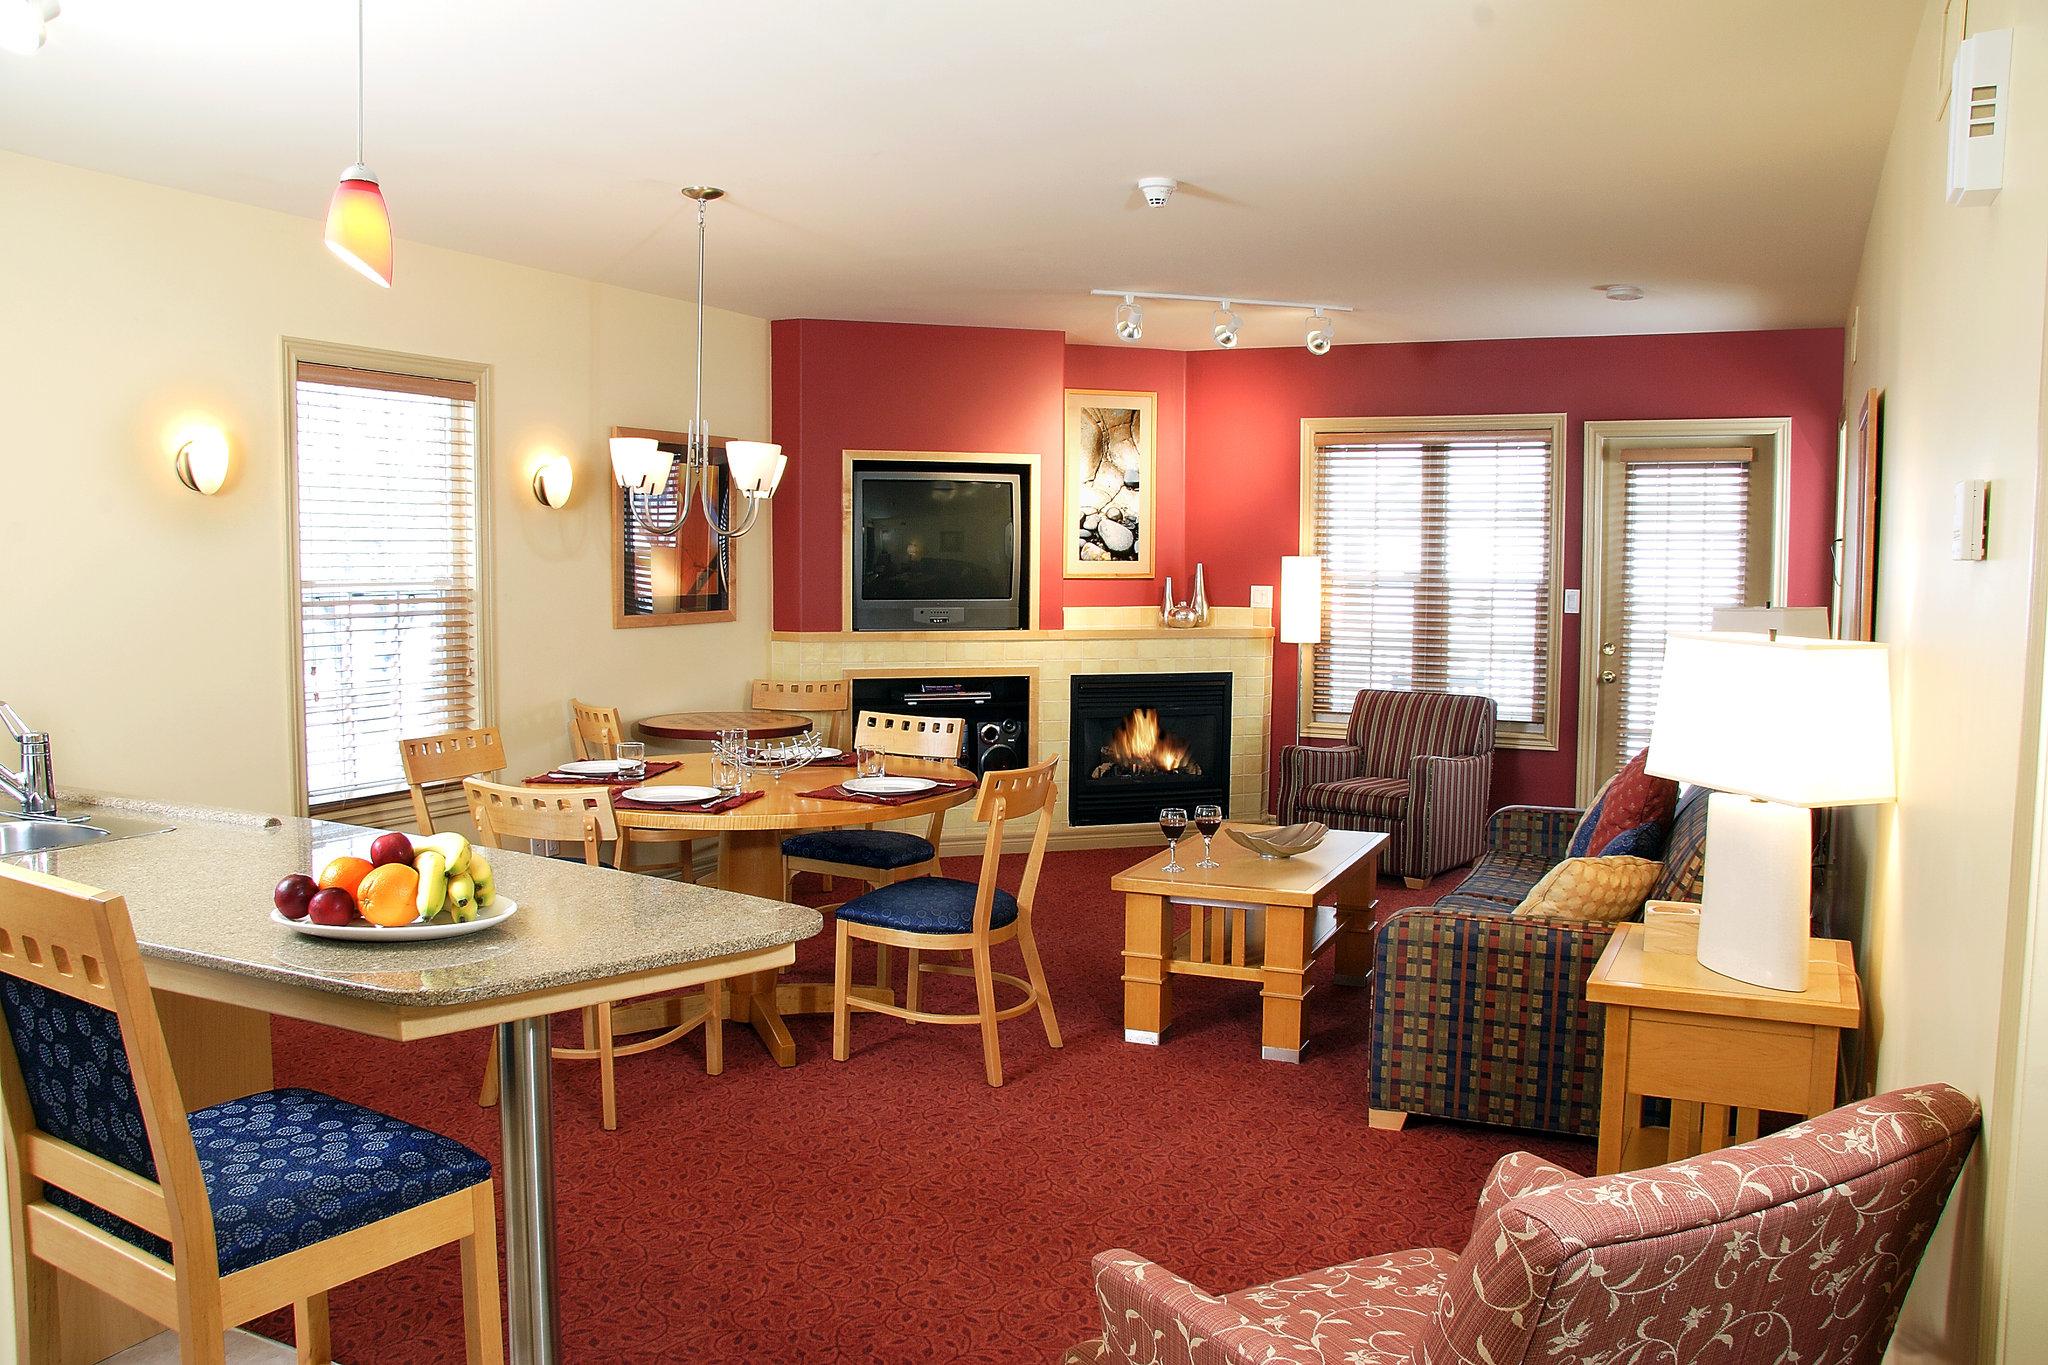 Resort-style Masterplanned Communities Blandford Homes Carriage hills resort photos